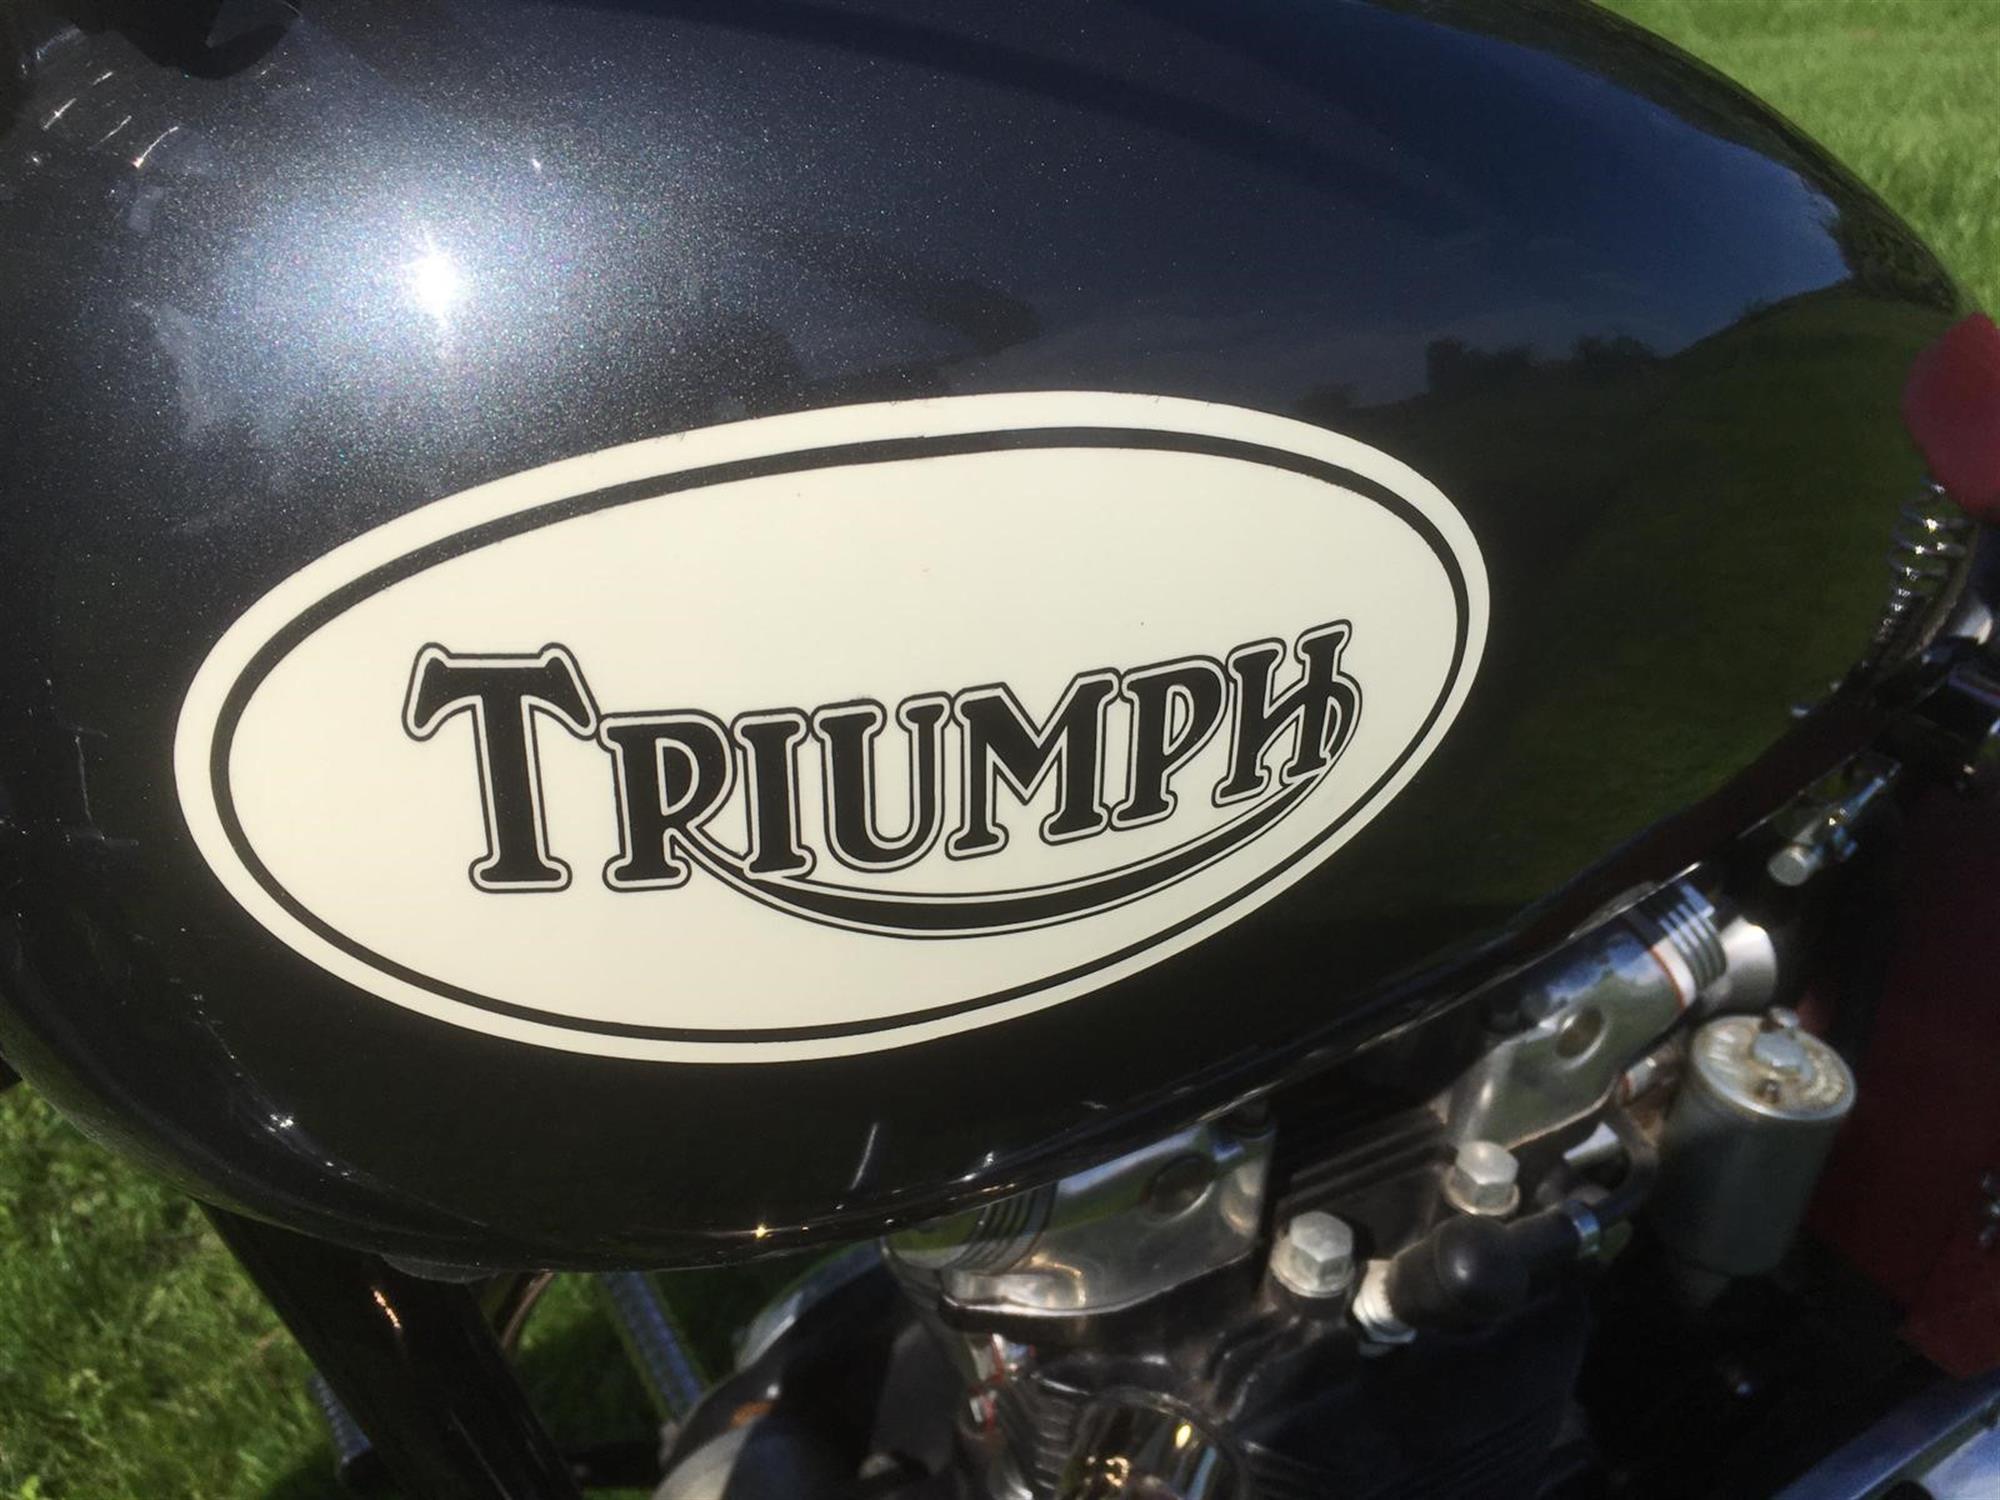 1952 Purdy Triumph 500 - Image 5 of 10